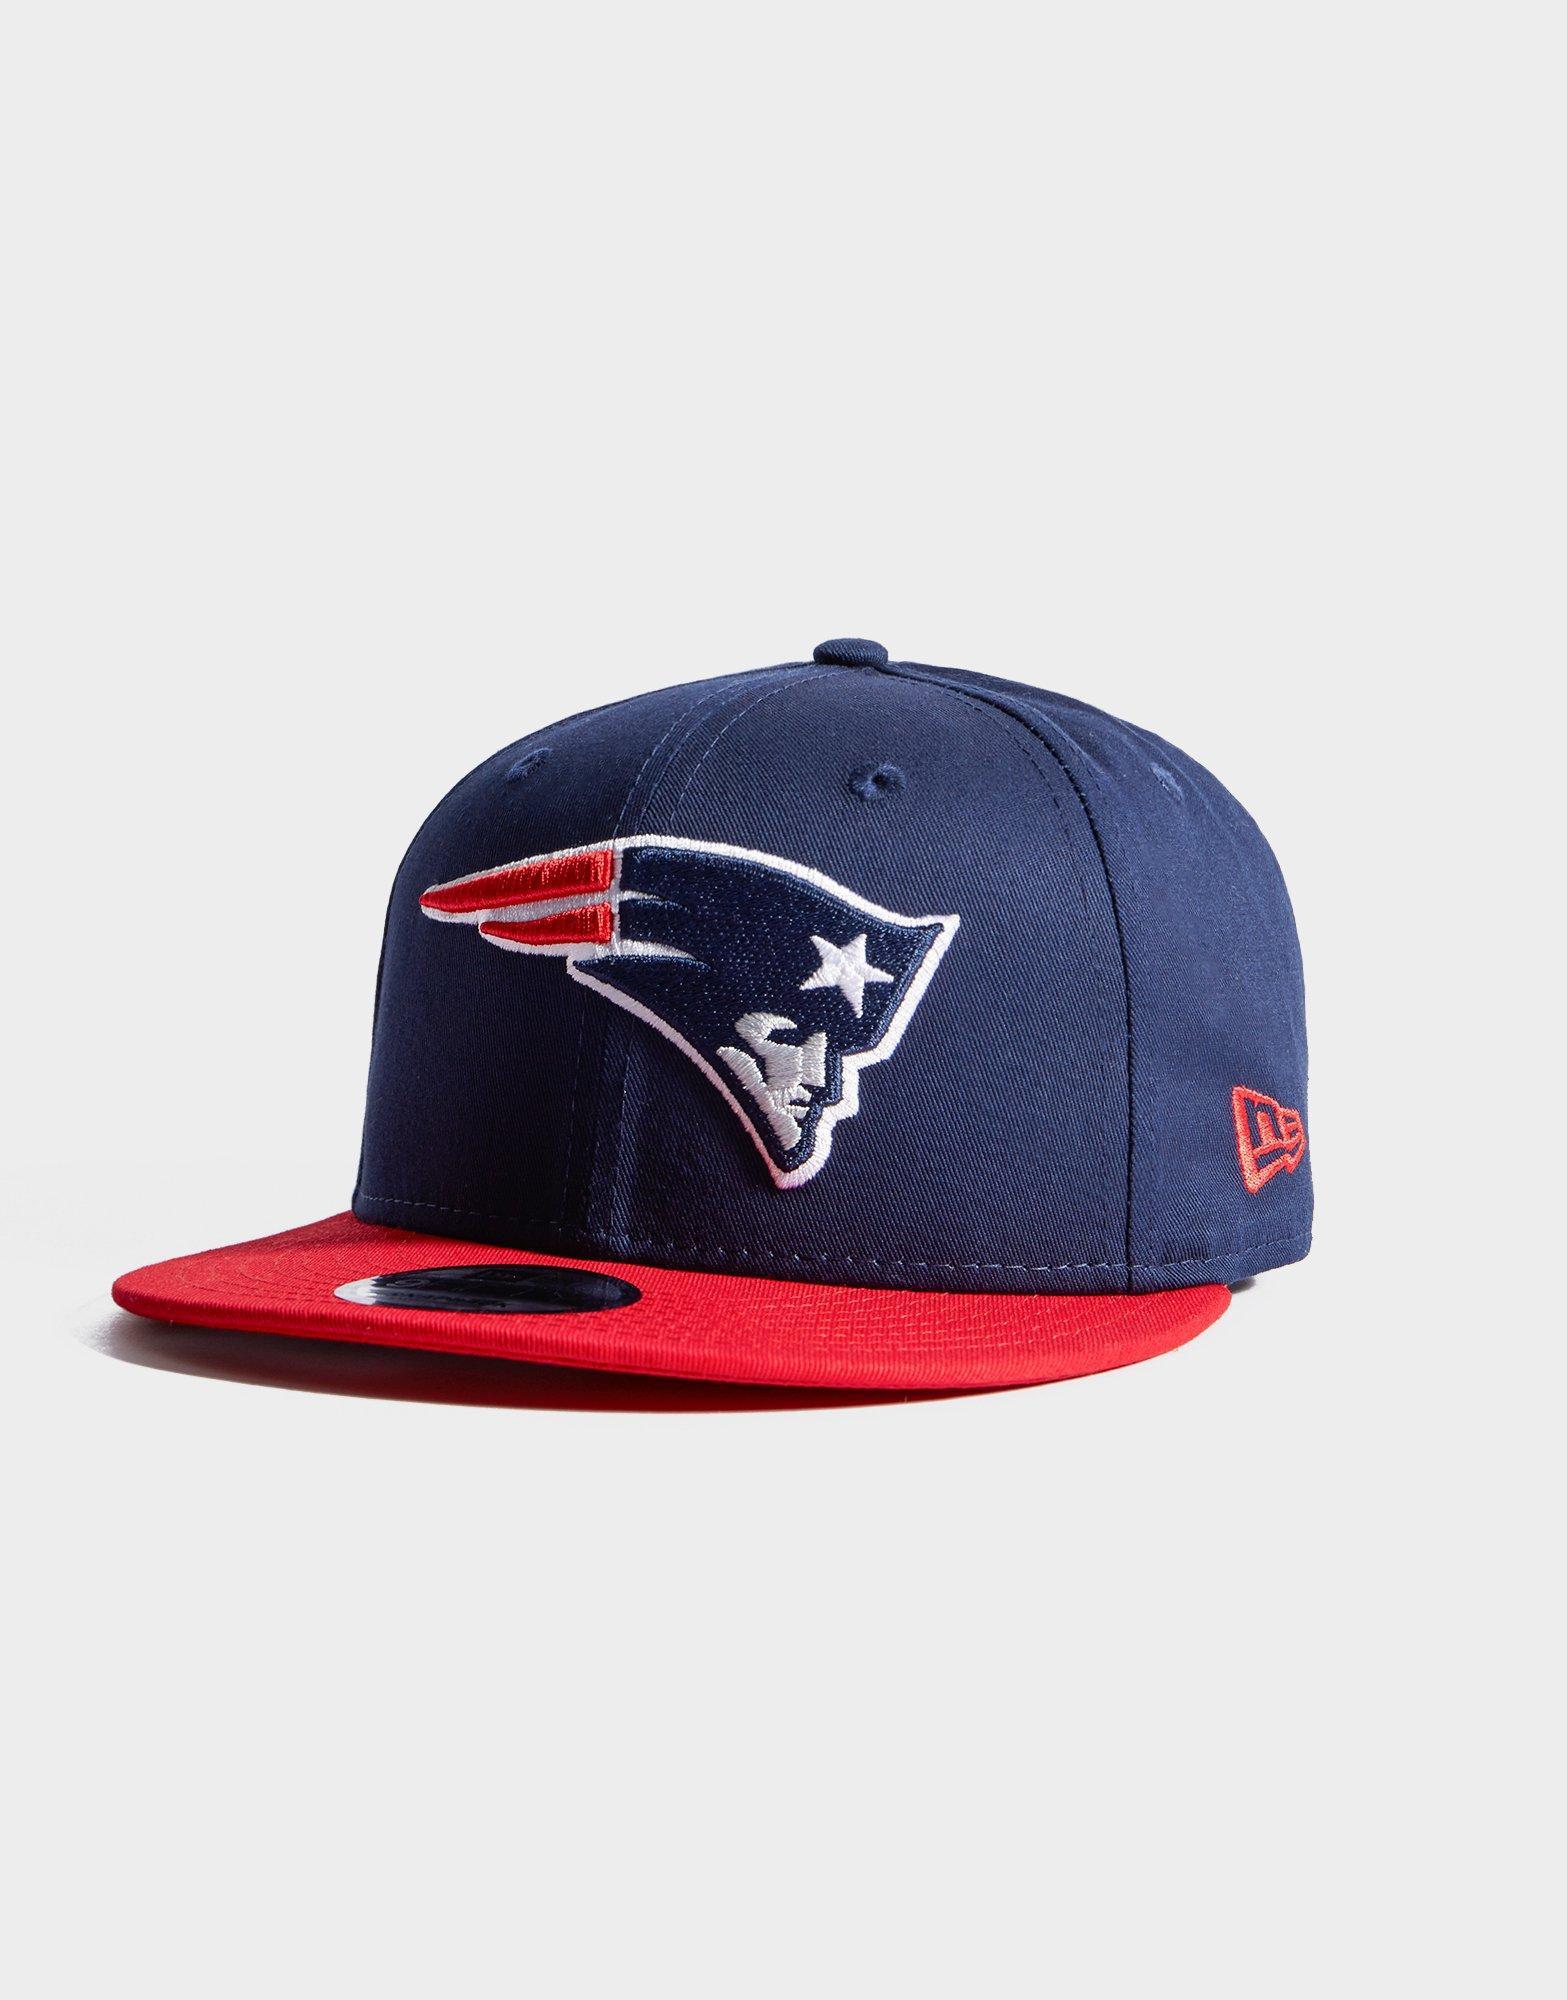 Lyst - Ktz Nfl New England Patriots 9fifty Cap in Blue 6ed93edccc9a